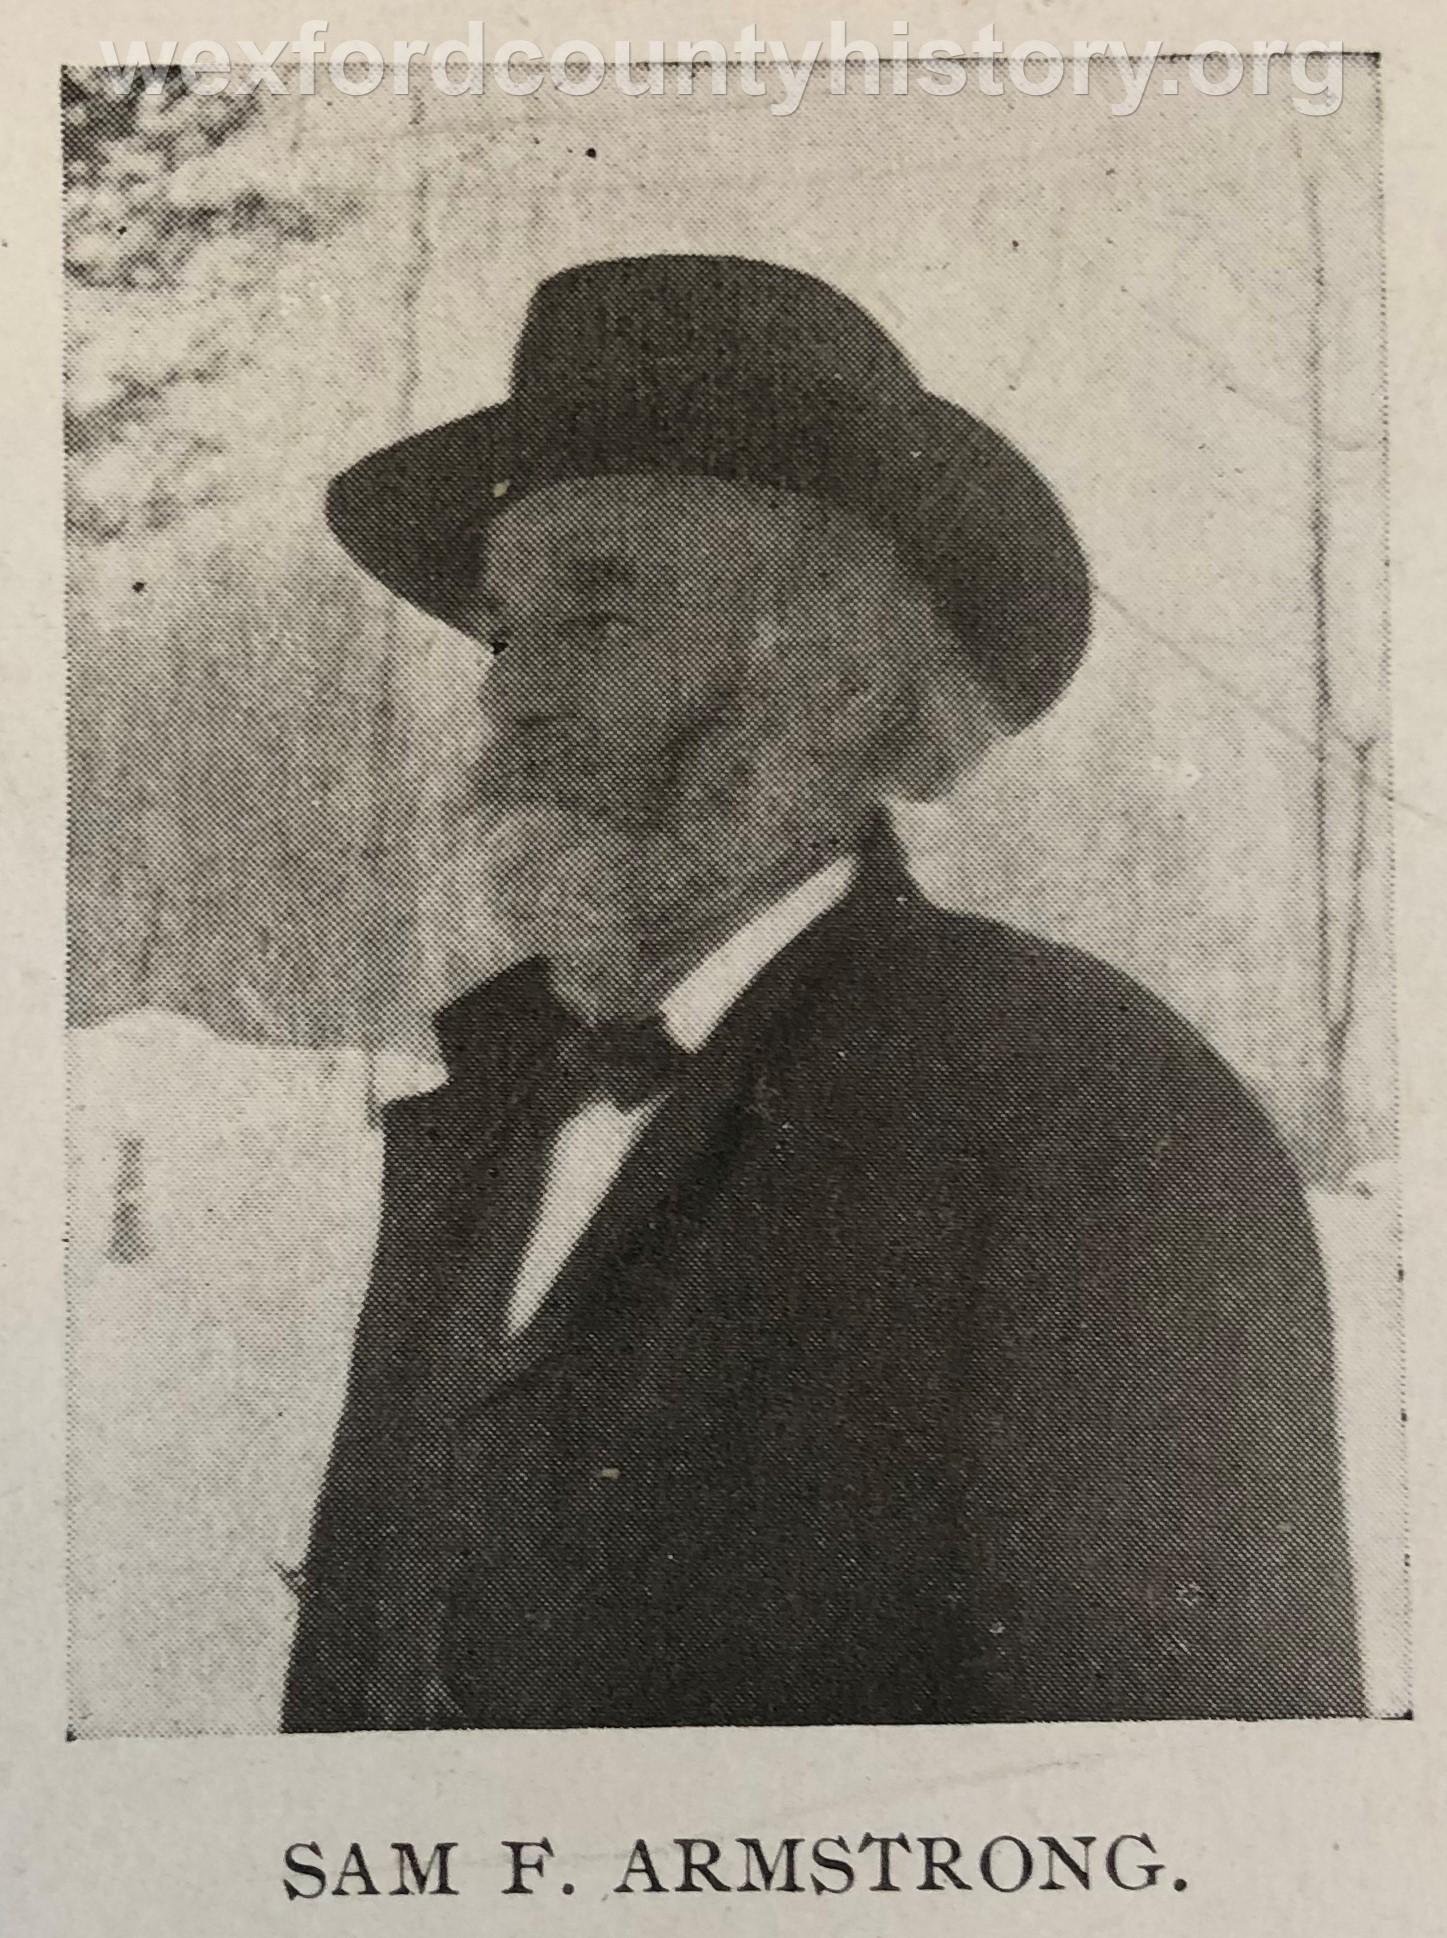 Samuel F. Armstrong